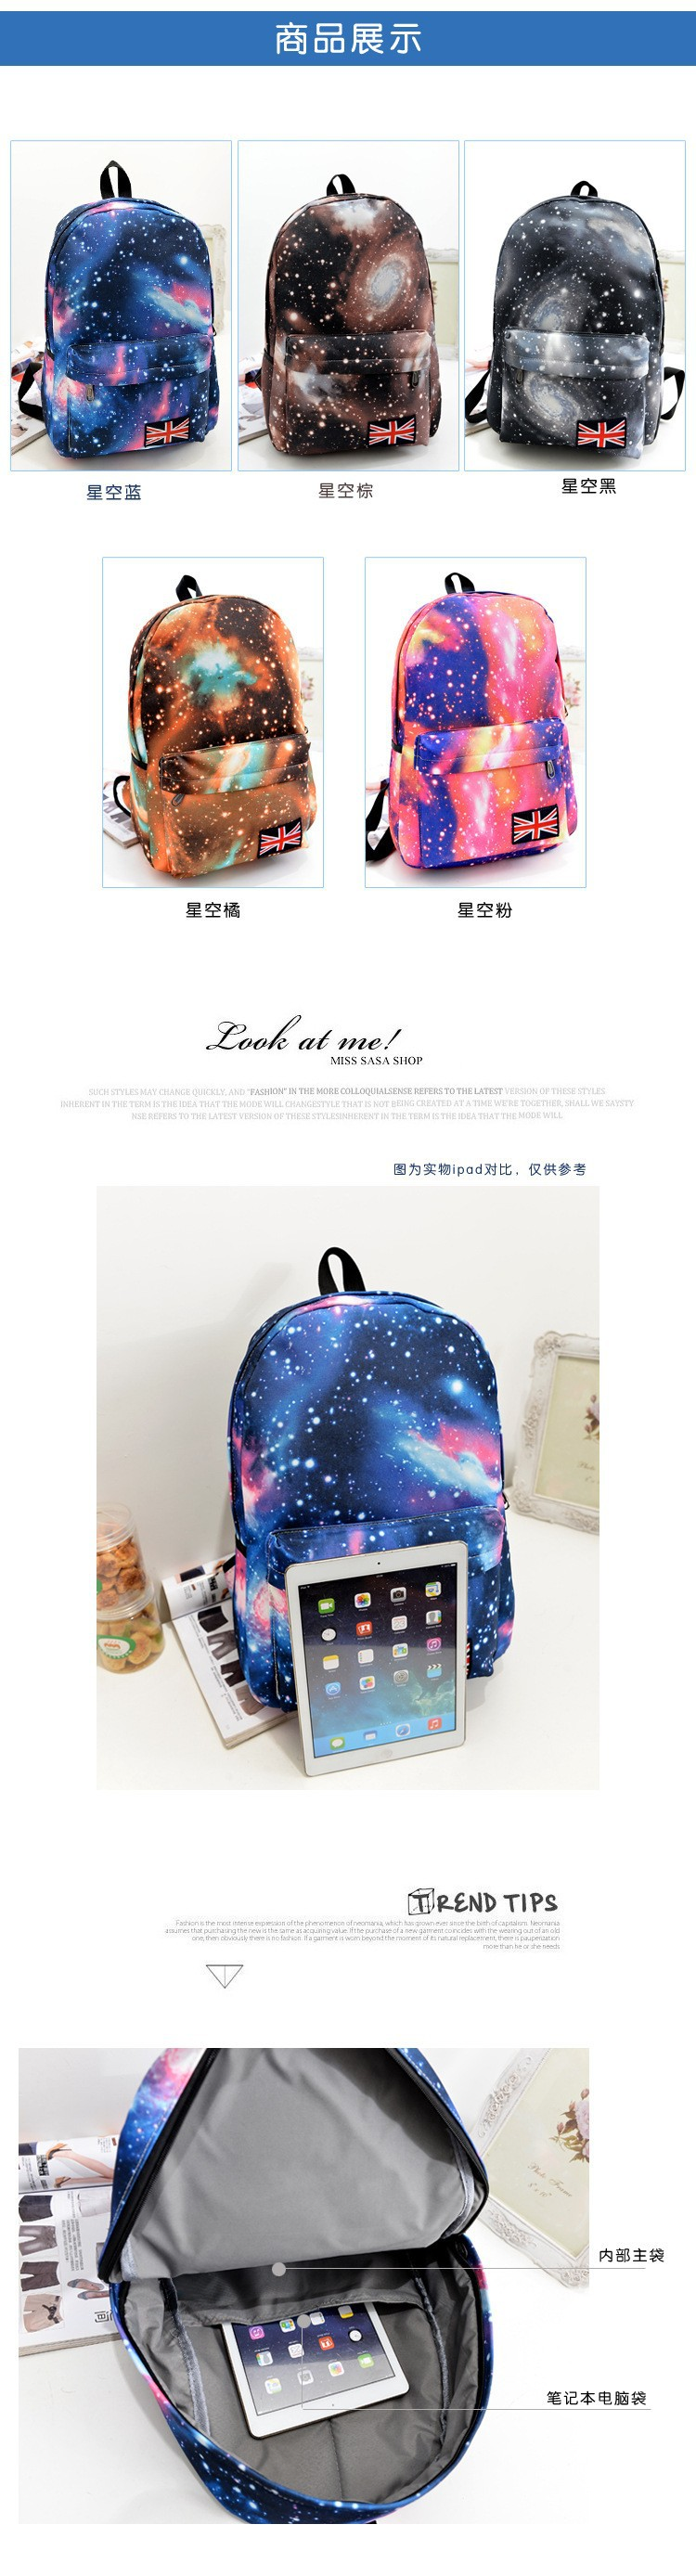 87bb5eaa66c0 2015 New Arrived Top Selling School Bag Backpack Large Zipper Fancy Milky  Way Printing Backpack